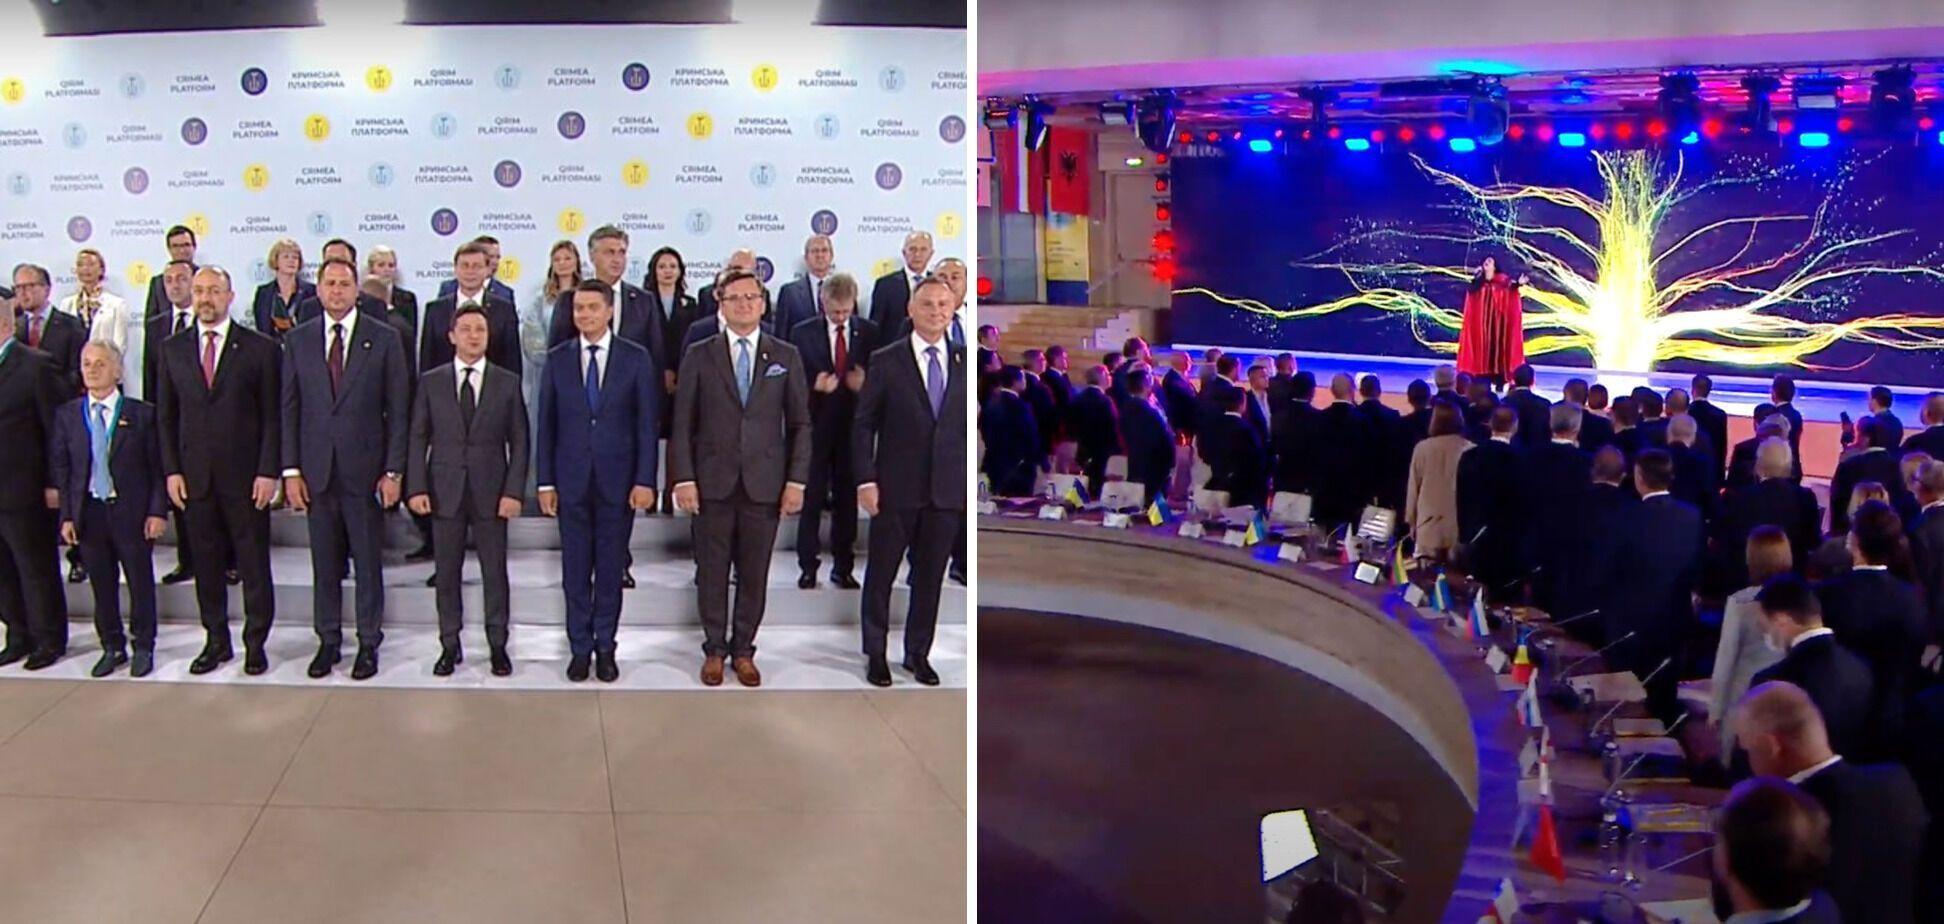 Старт саммита в Киеве